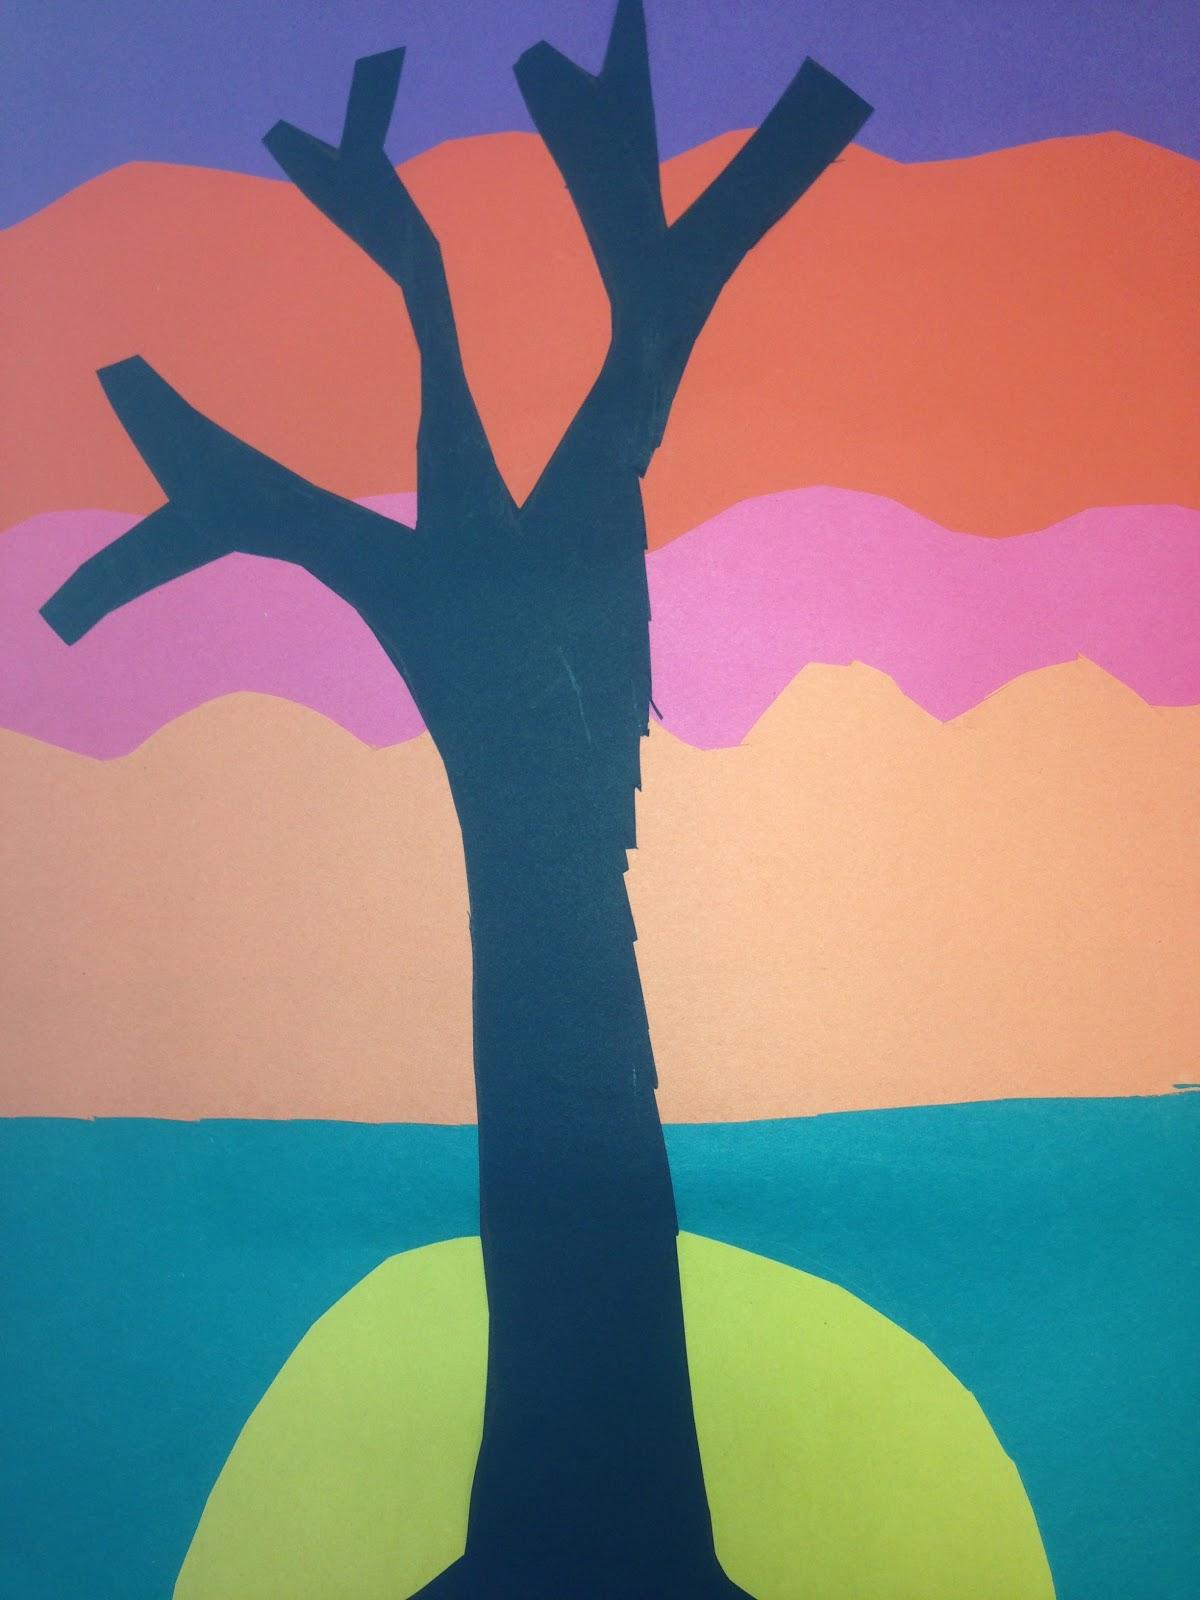 K12 The Art Gallery Twilight LandscapesLayered Paper